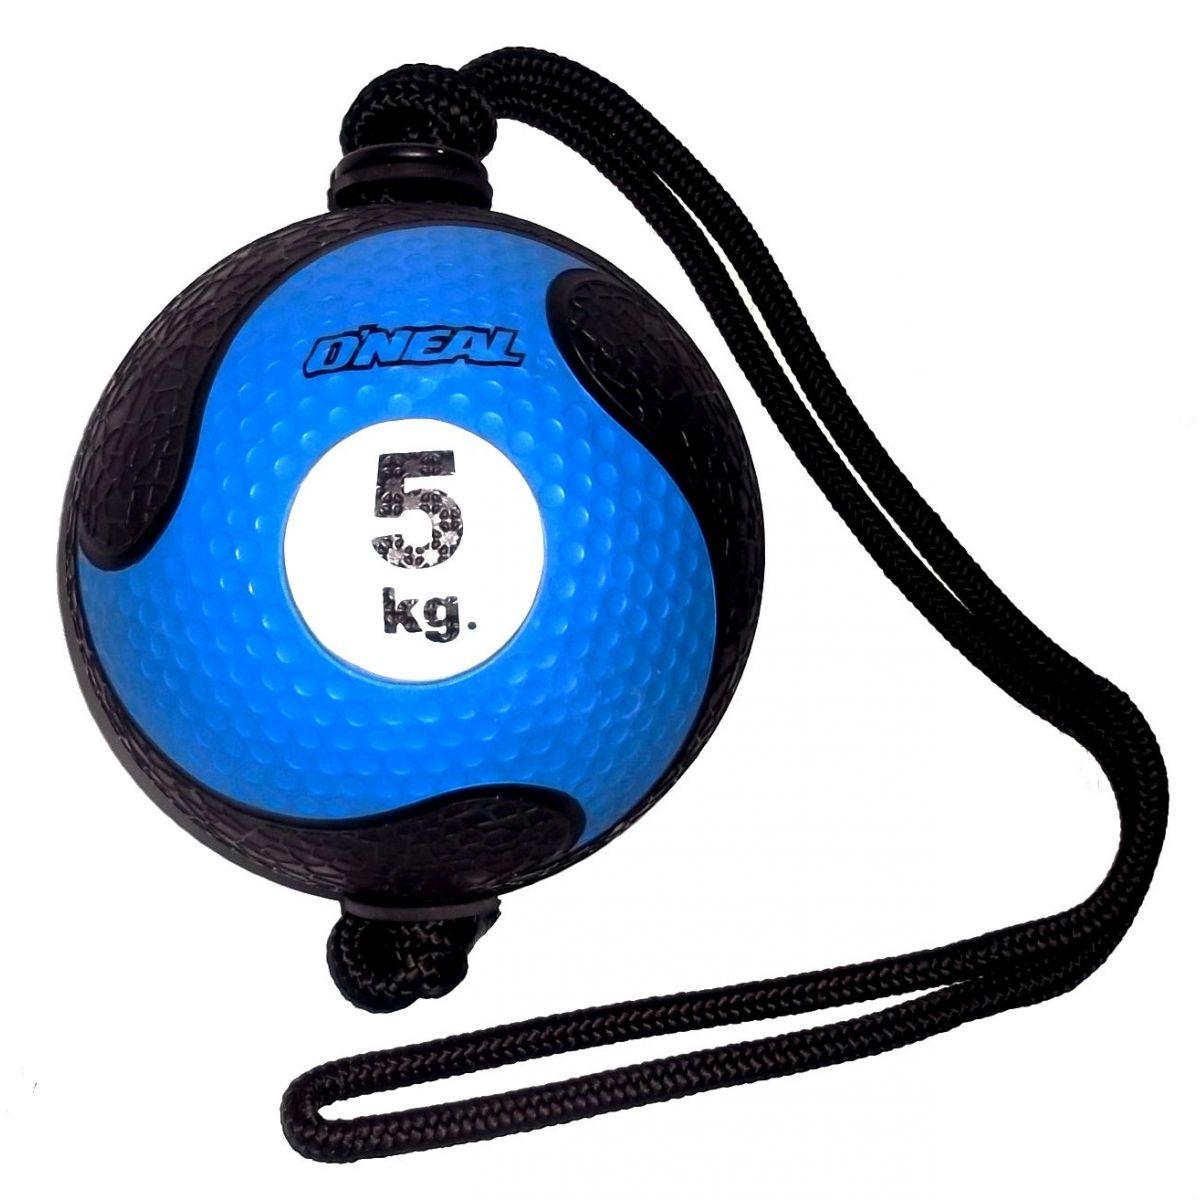 Medicine ball corda 5kg borracha azul unisex yoga oneal